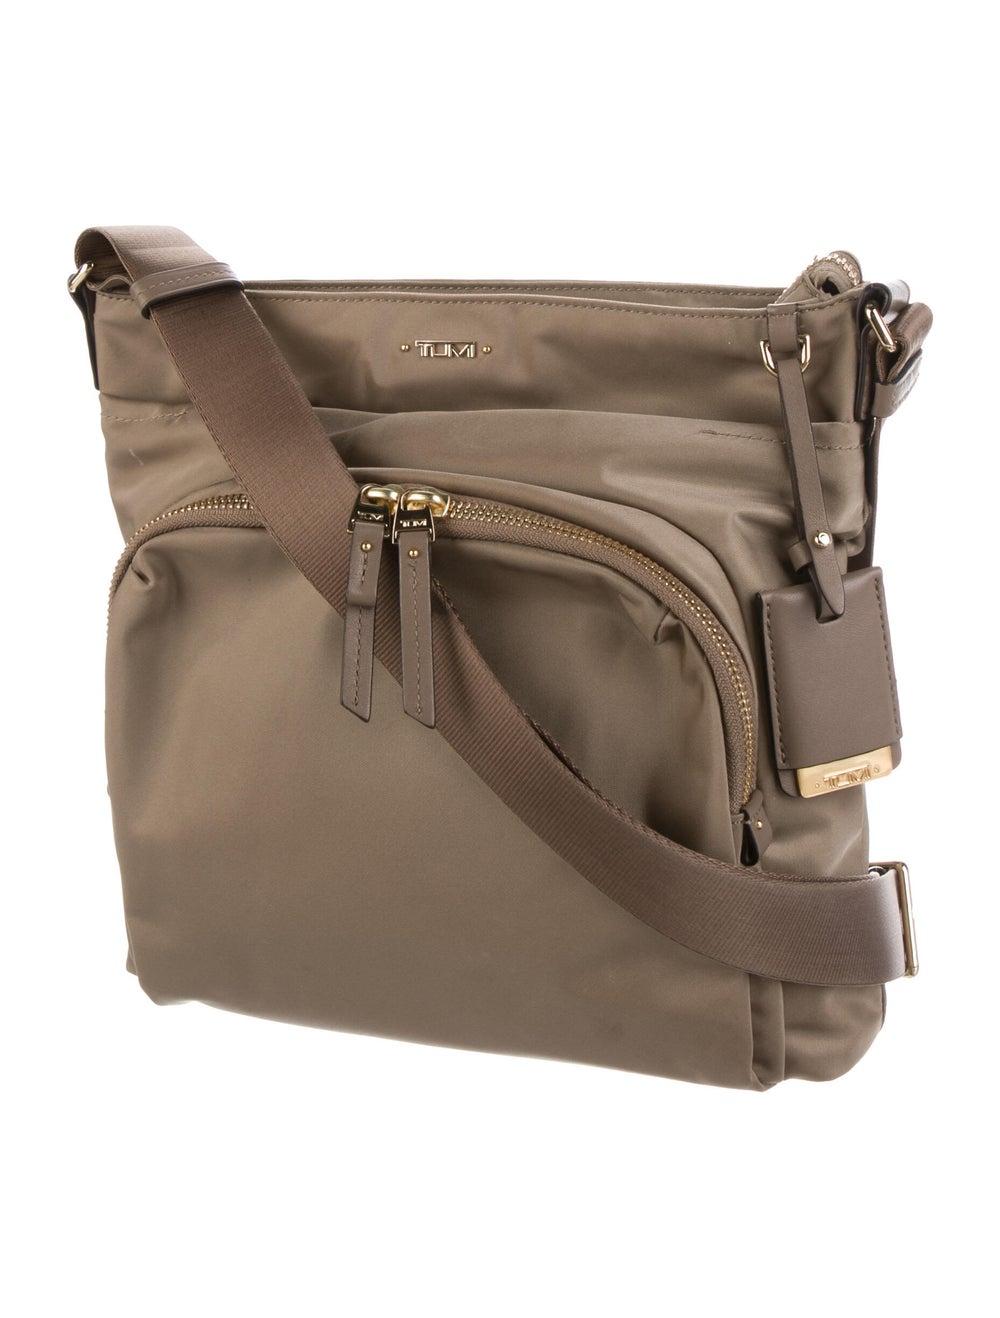 Tumi Nylon SHoulder Bag Gold - image 3